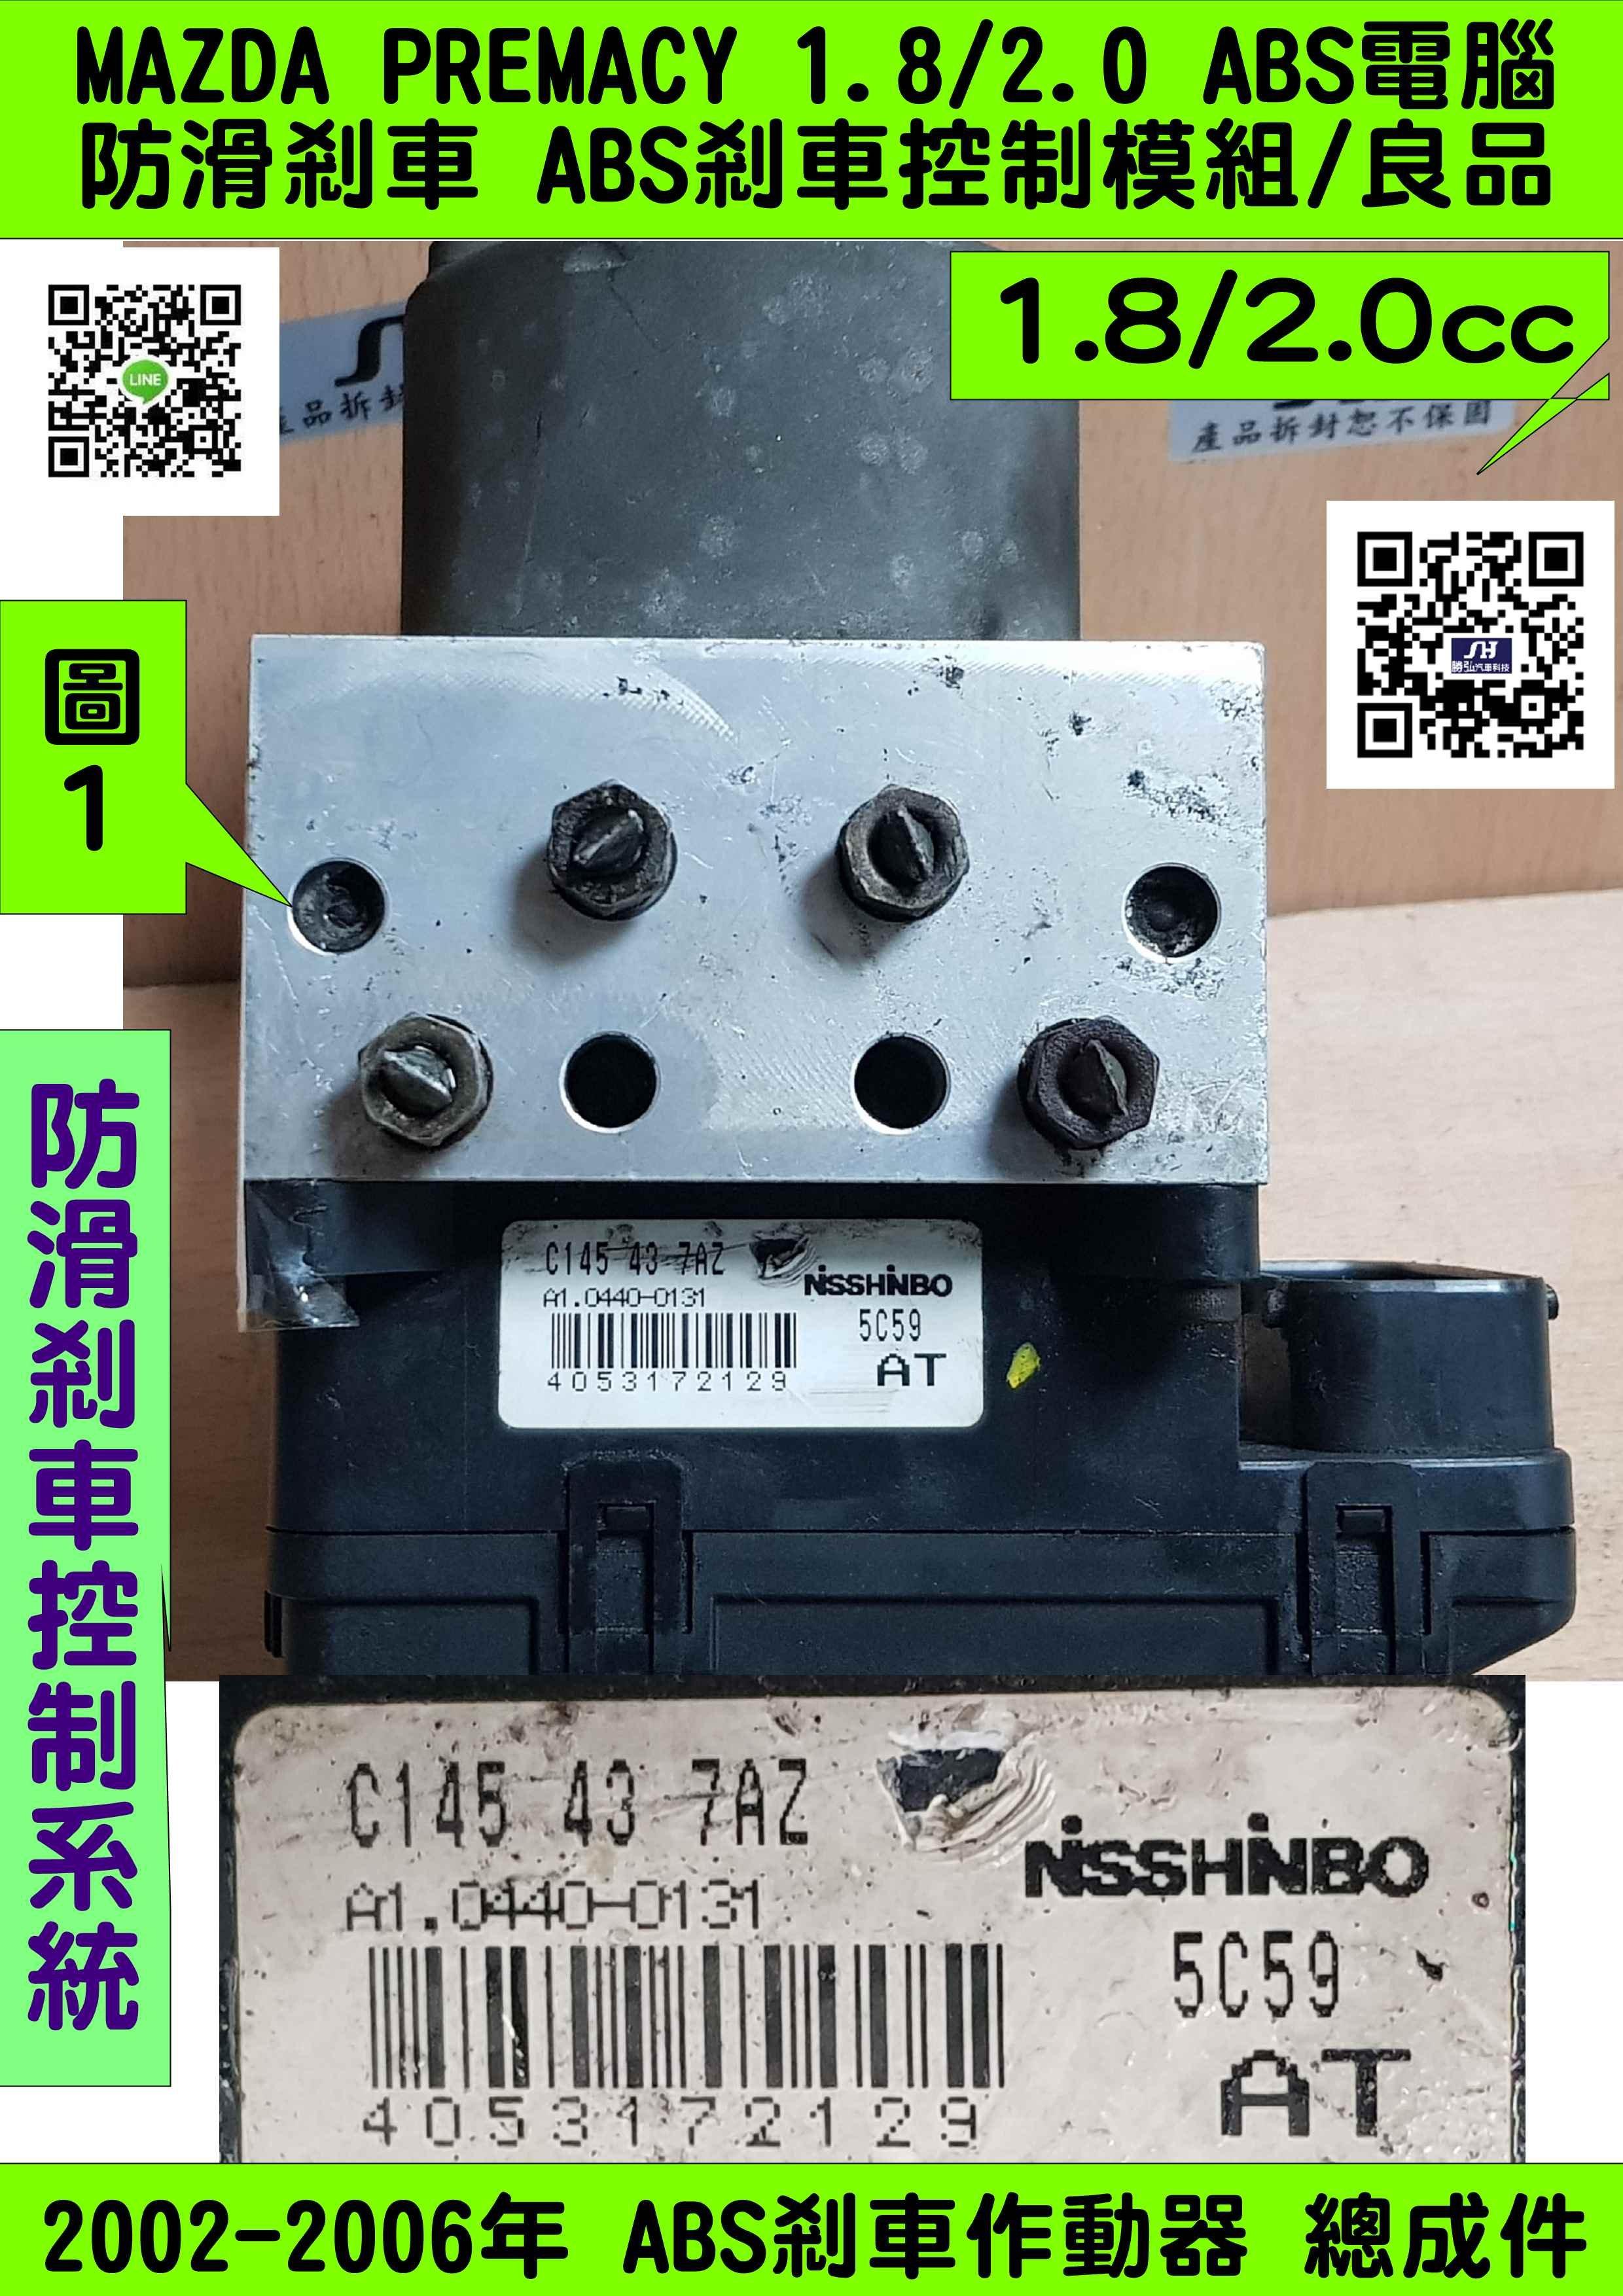 MAZDA PREMACY 1. 2.0 2001- C100 43 7AZ ABS剎車控制模組 ABS電腦  防滑剎車